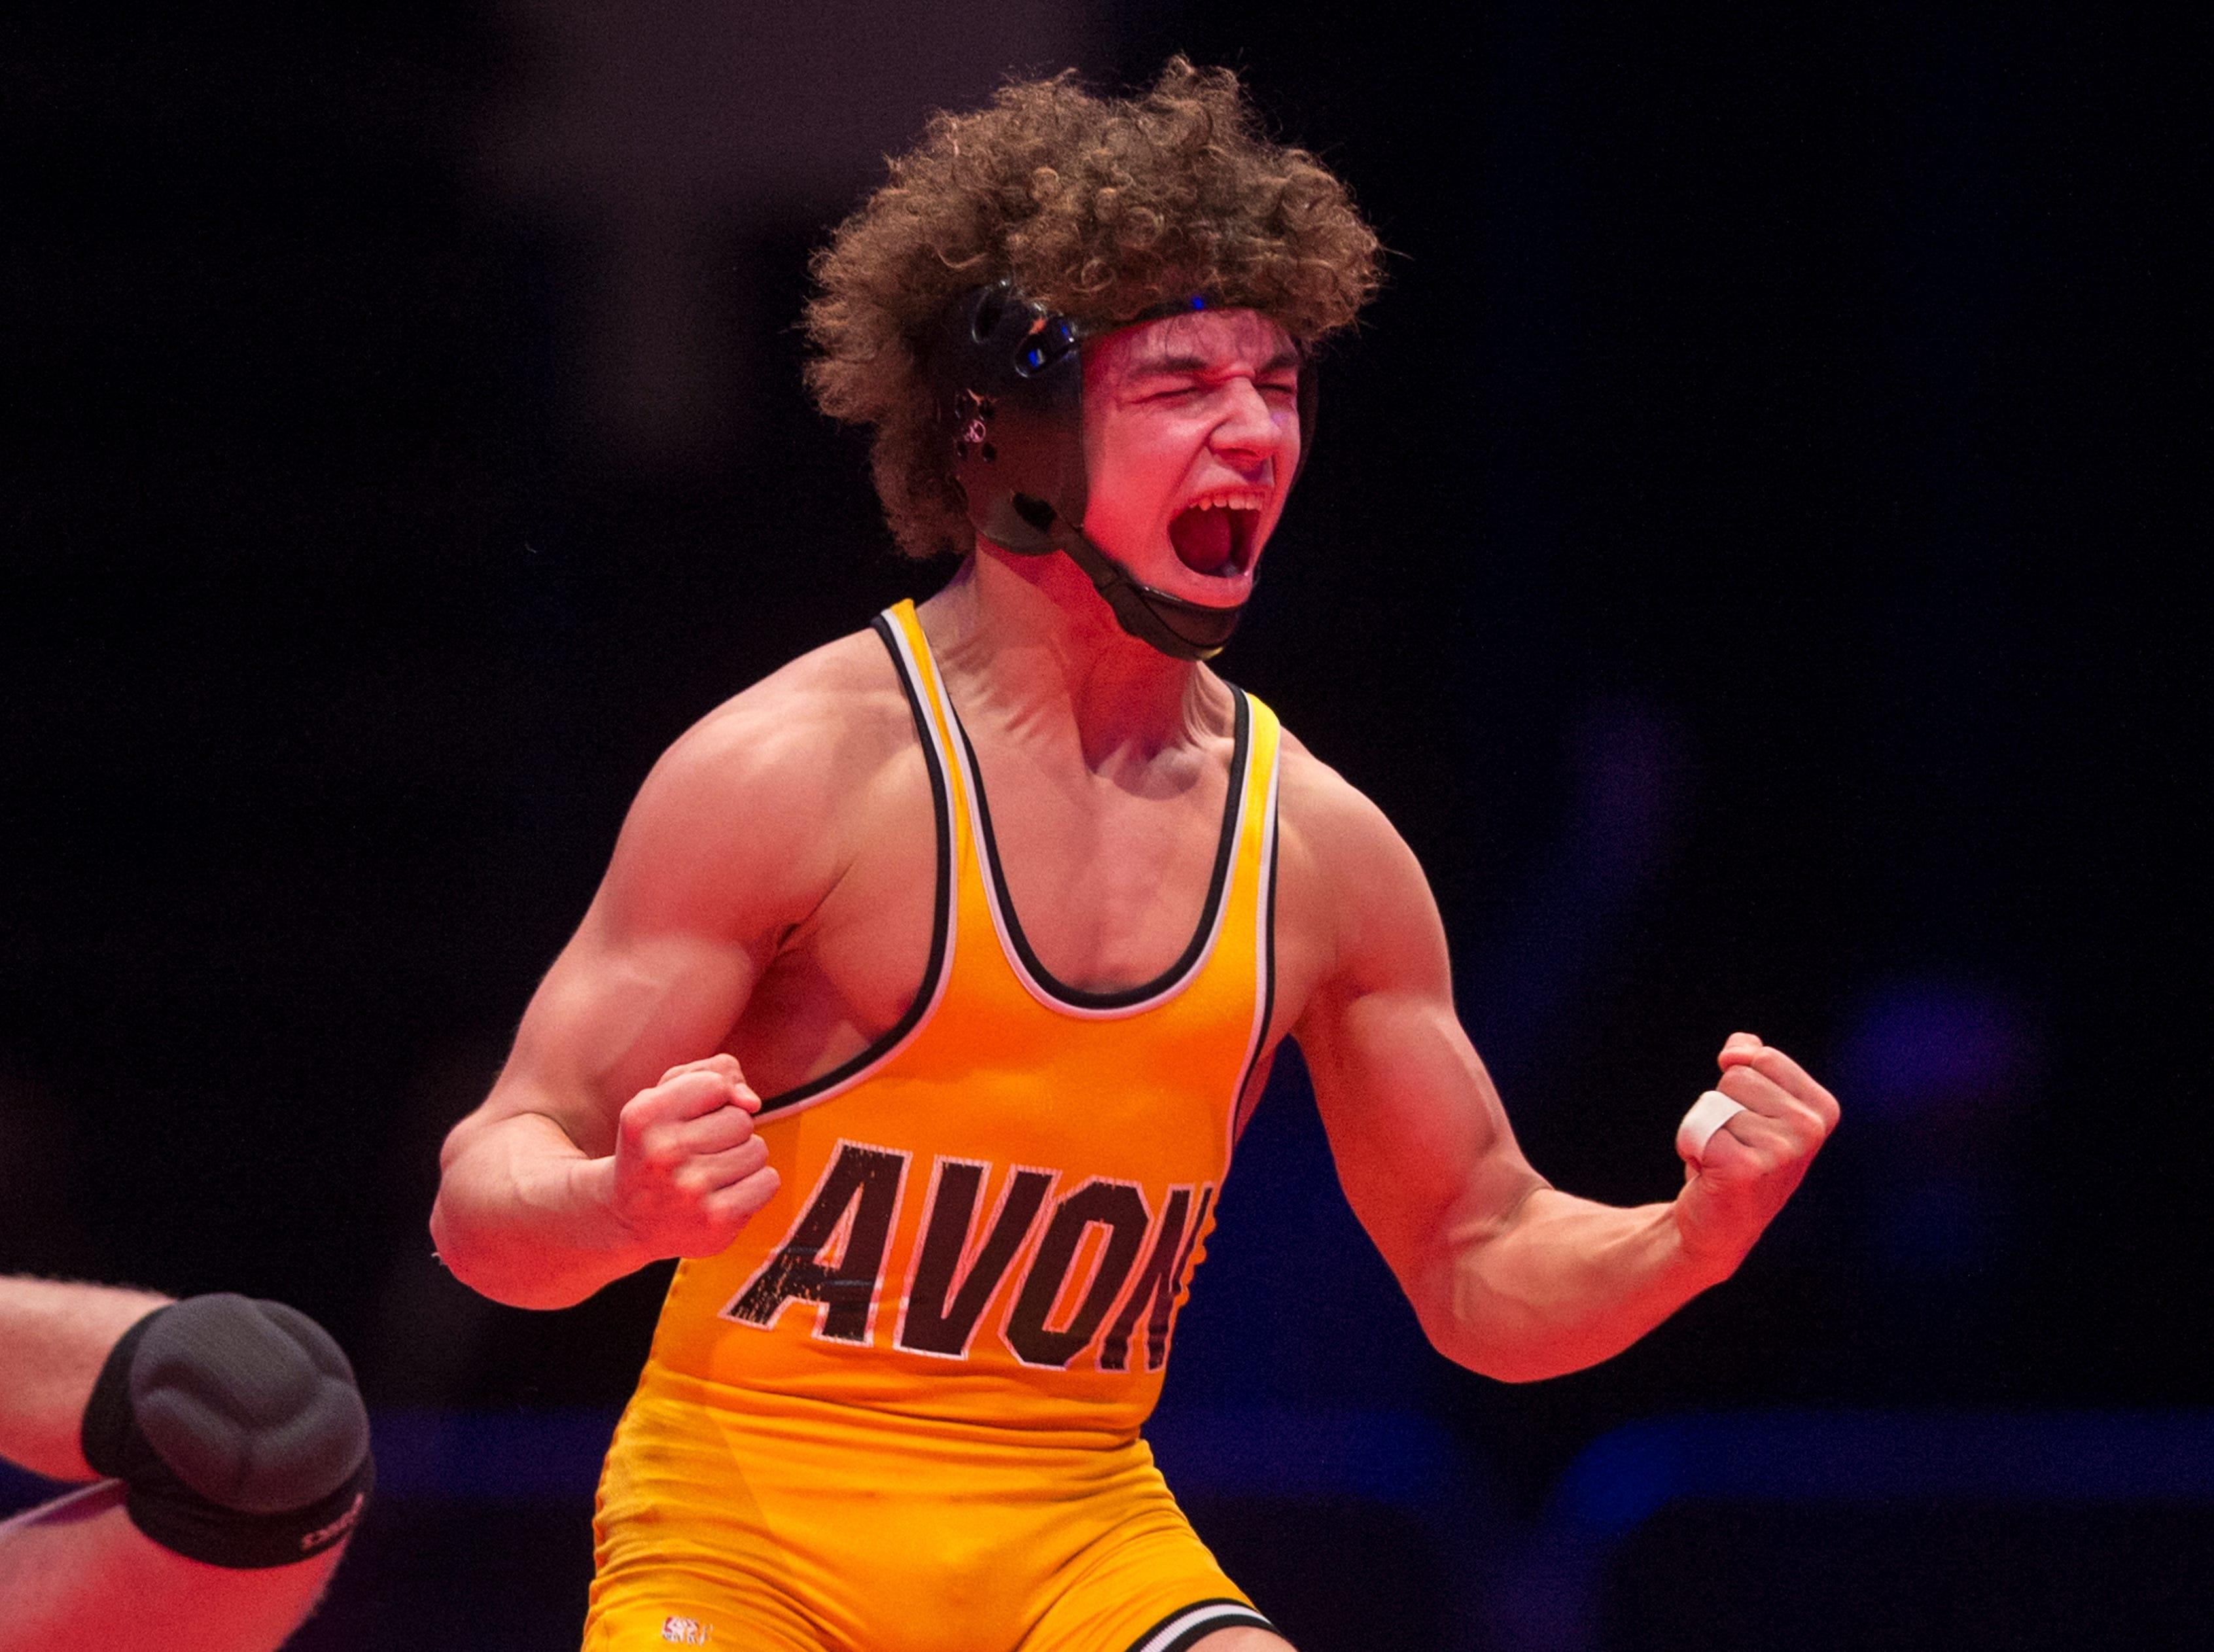 Asa Garcia battles for third state wrestling title